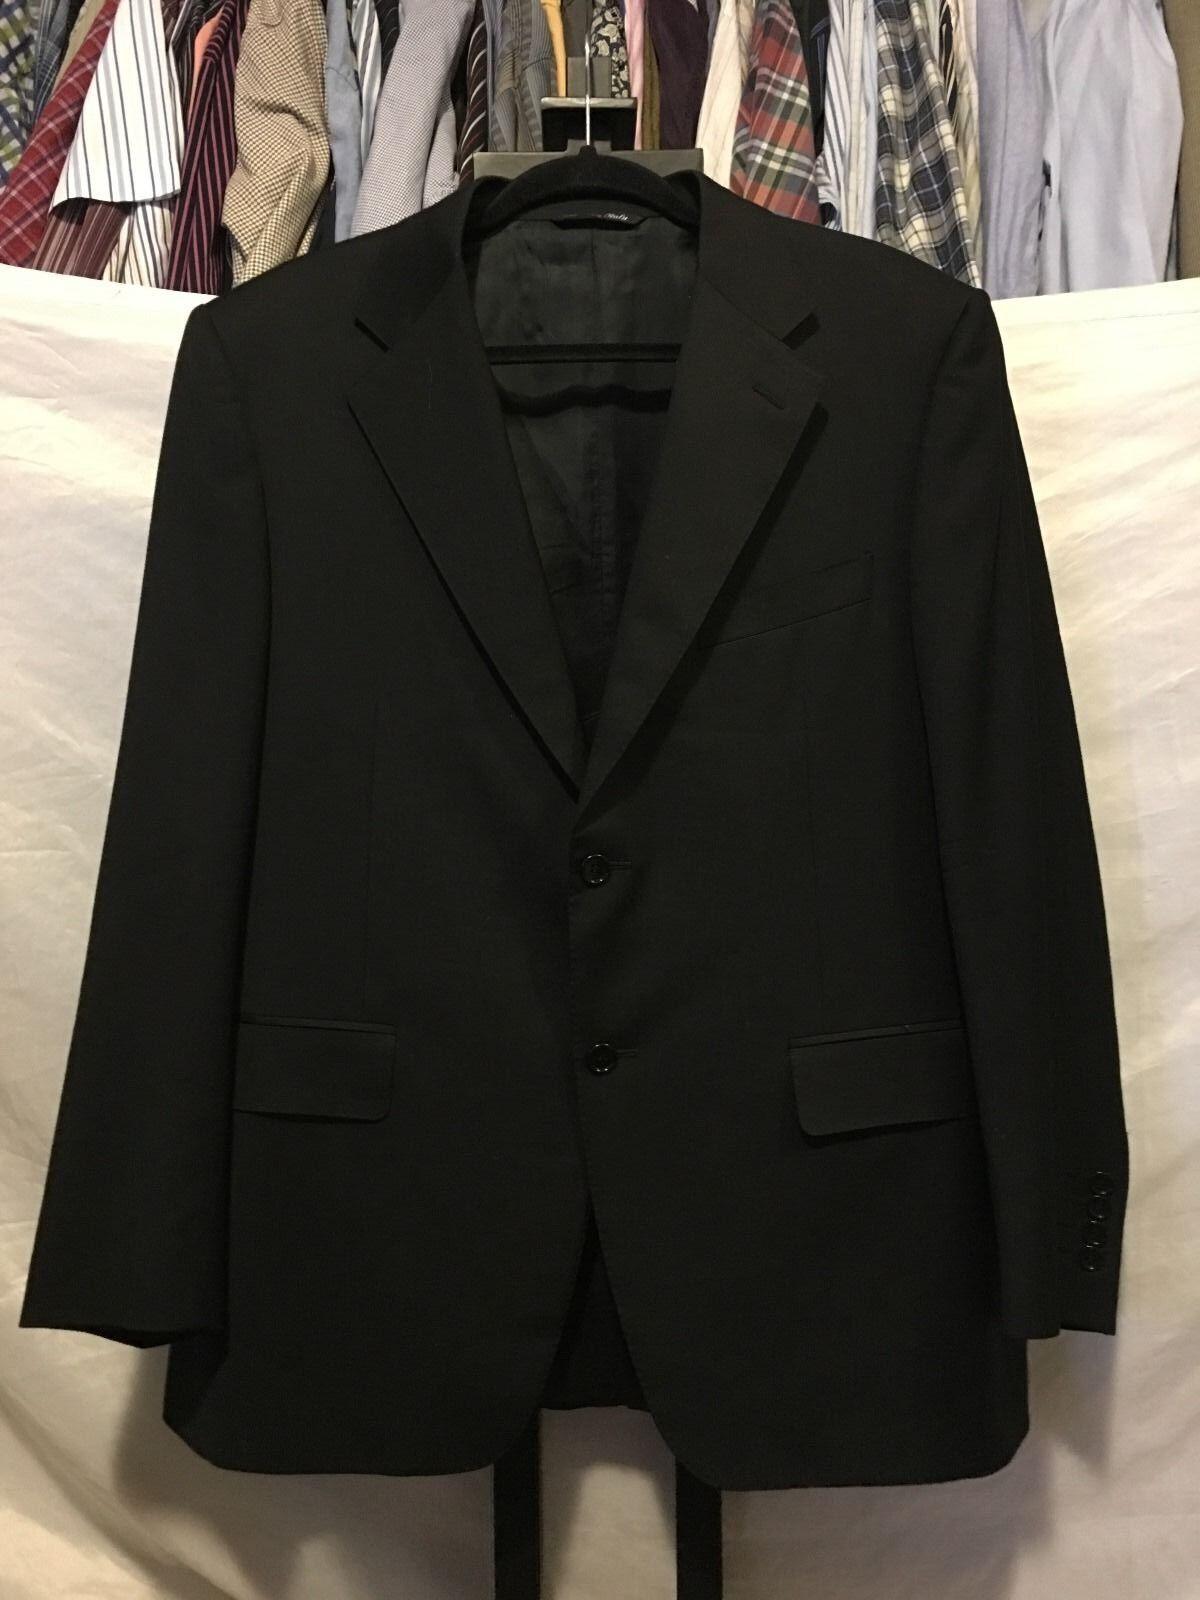 Canali Dark Grau 2 Button 2 Piece Vented Wool Suit  44R (52R) 33 X 30